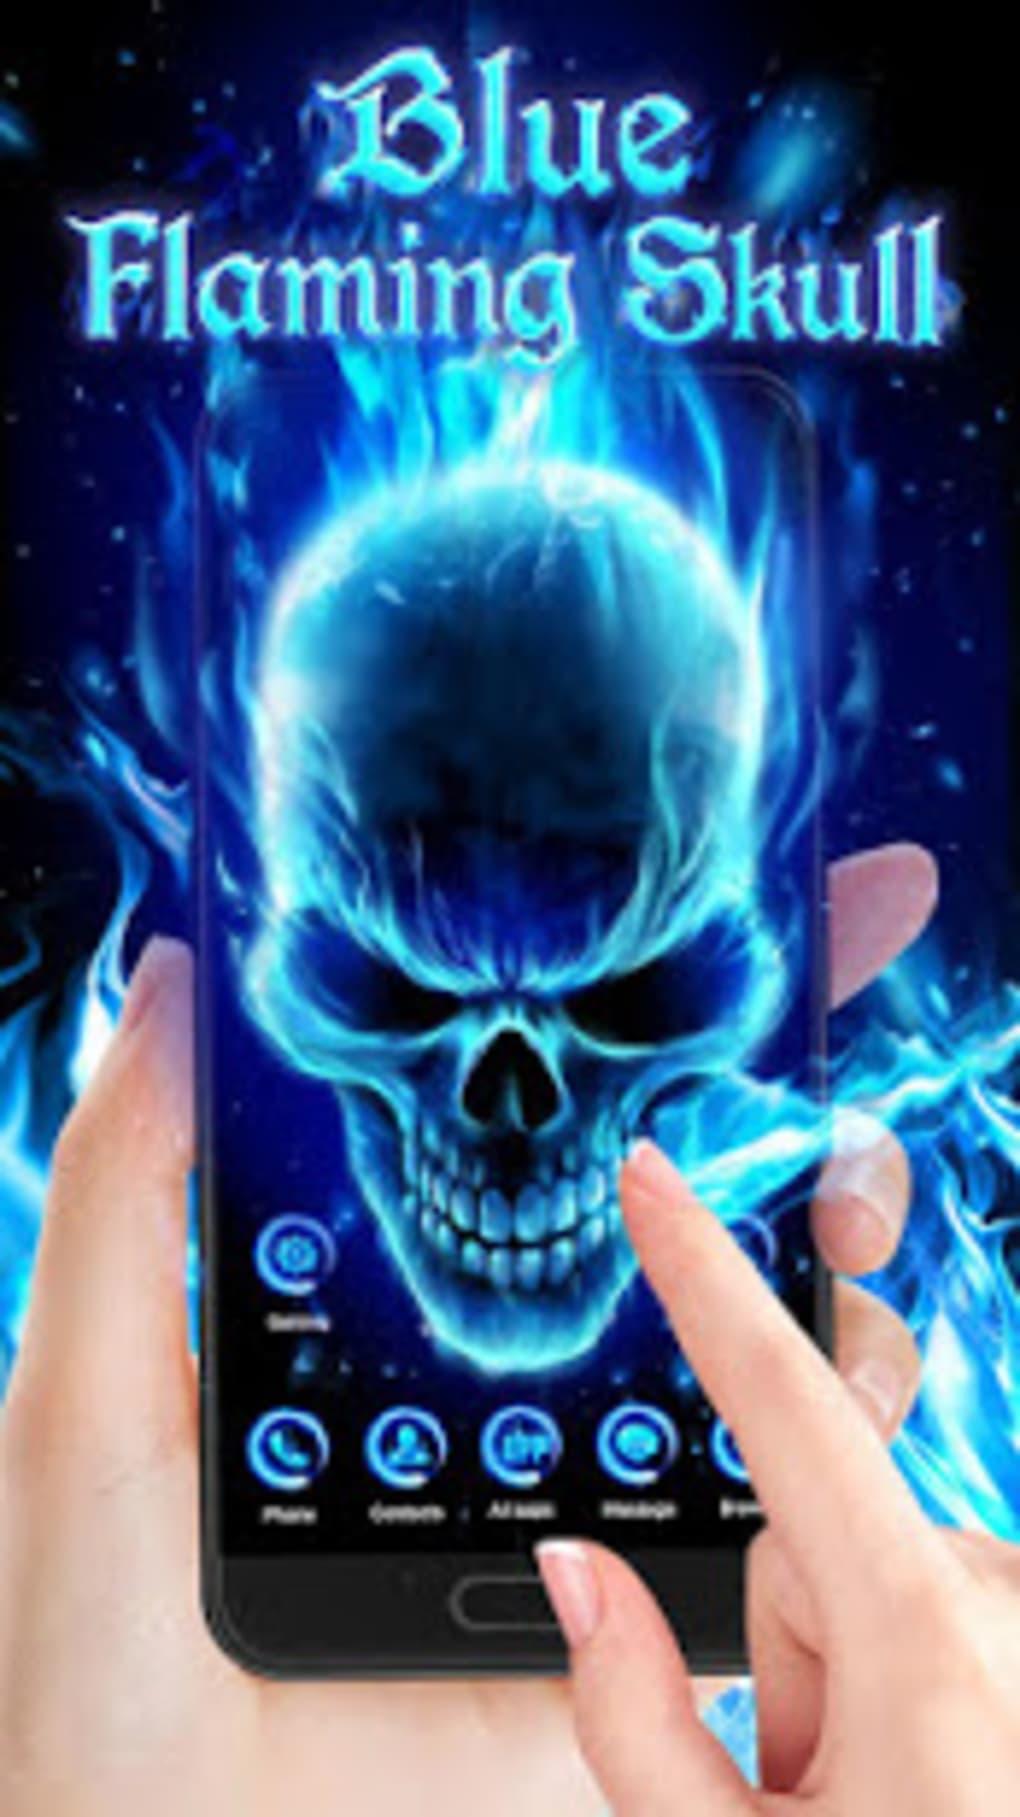 3d Blue Flaming Skull Theme Launcher Skull Theme 1020x1817 Download Hd Wallpaper Wallpapertip